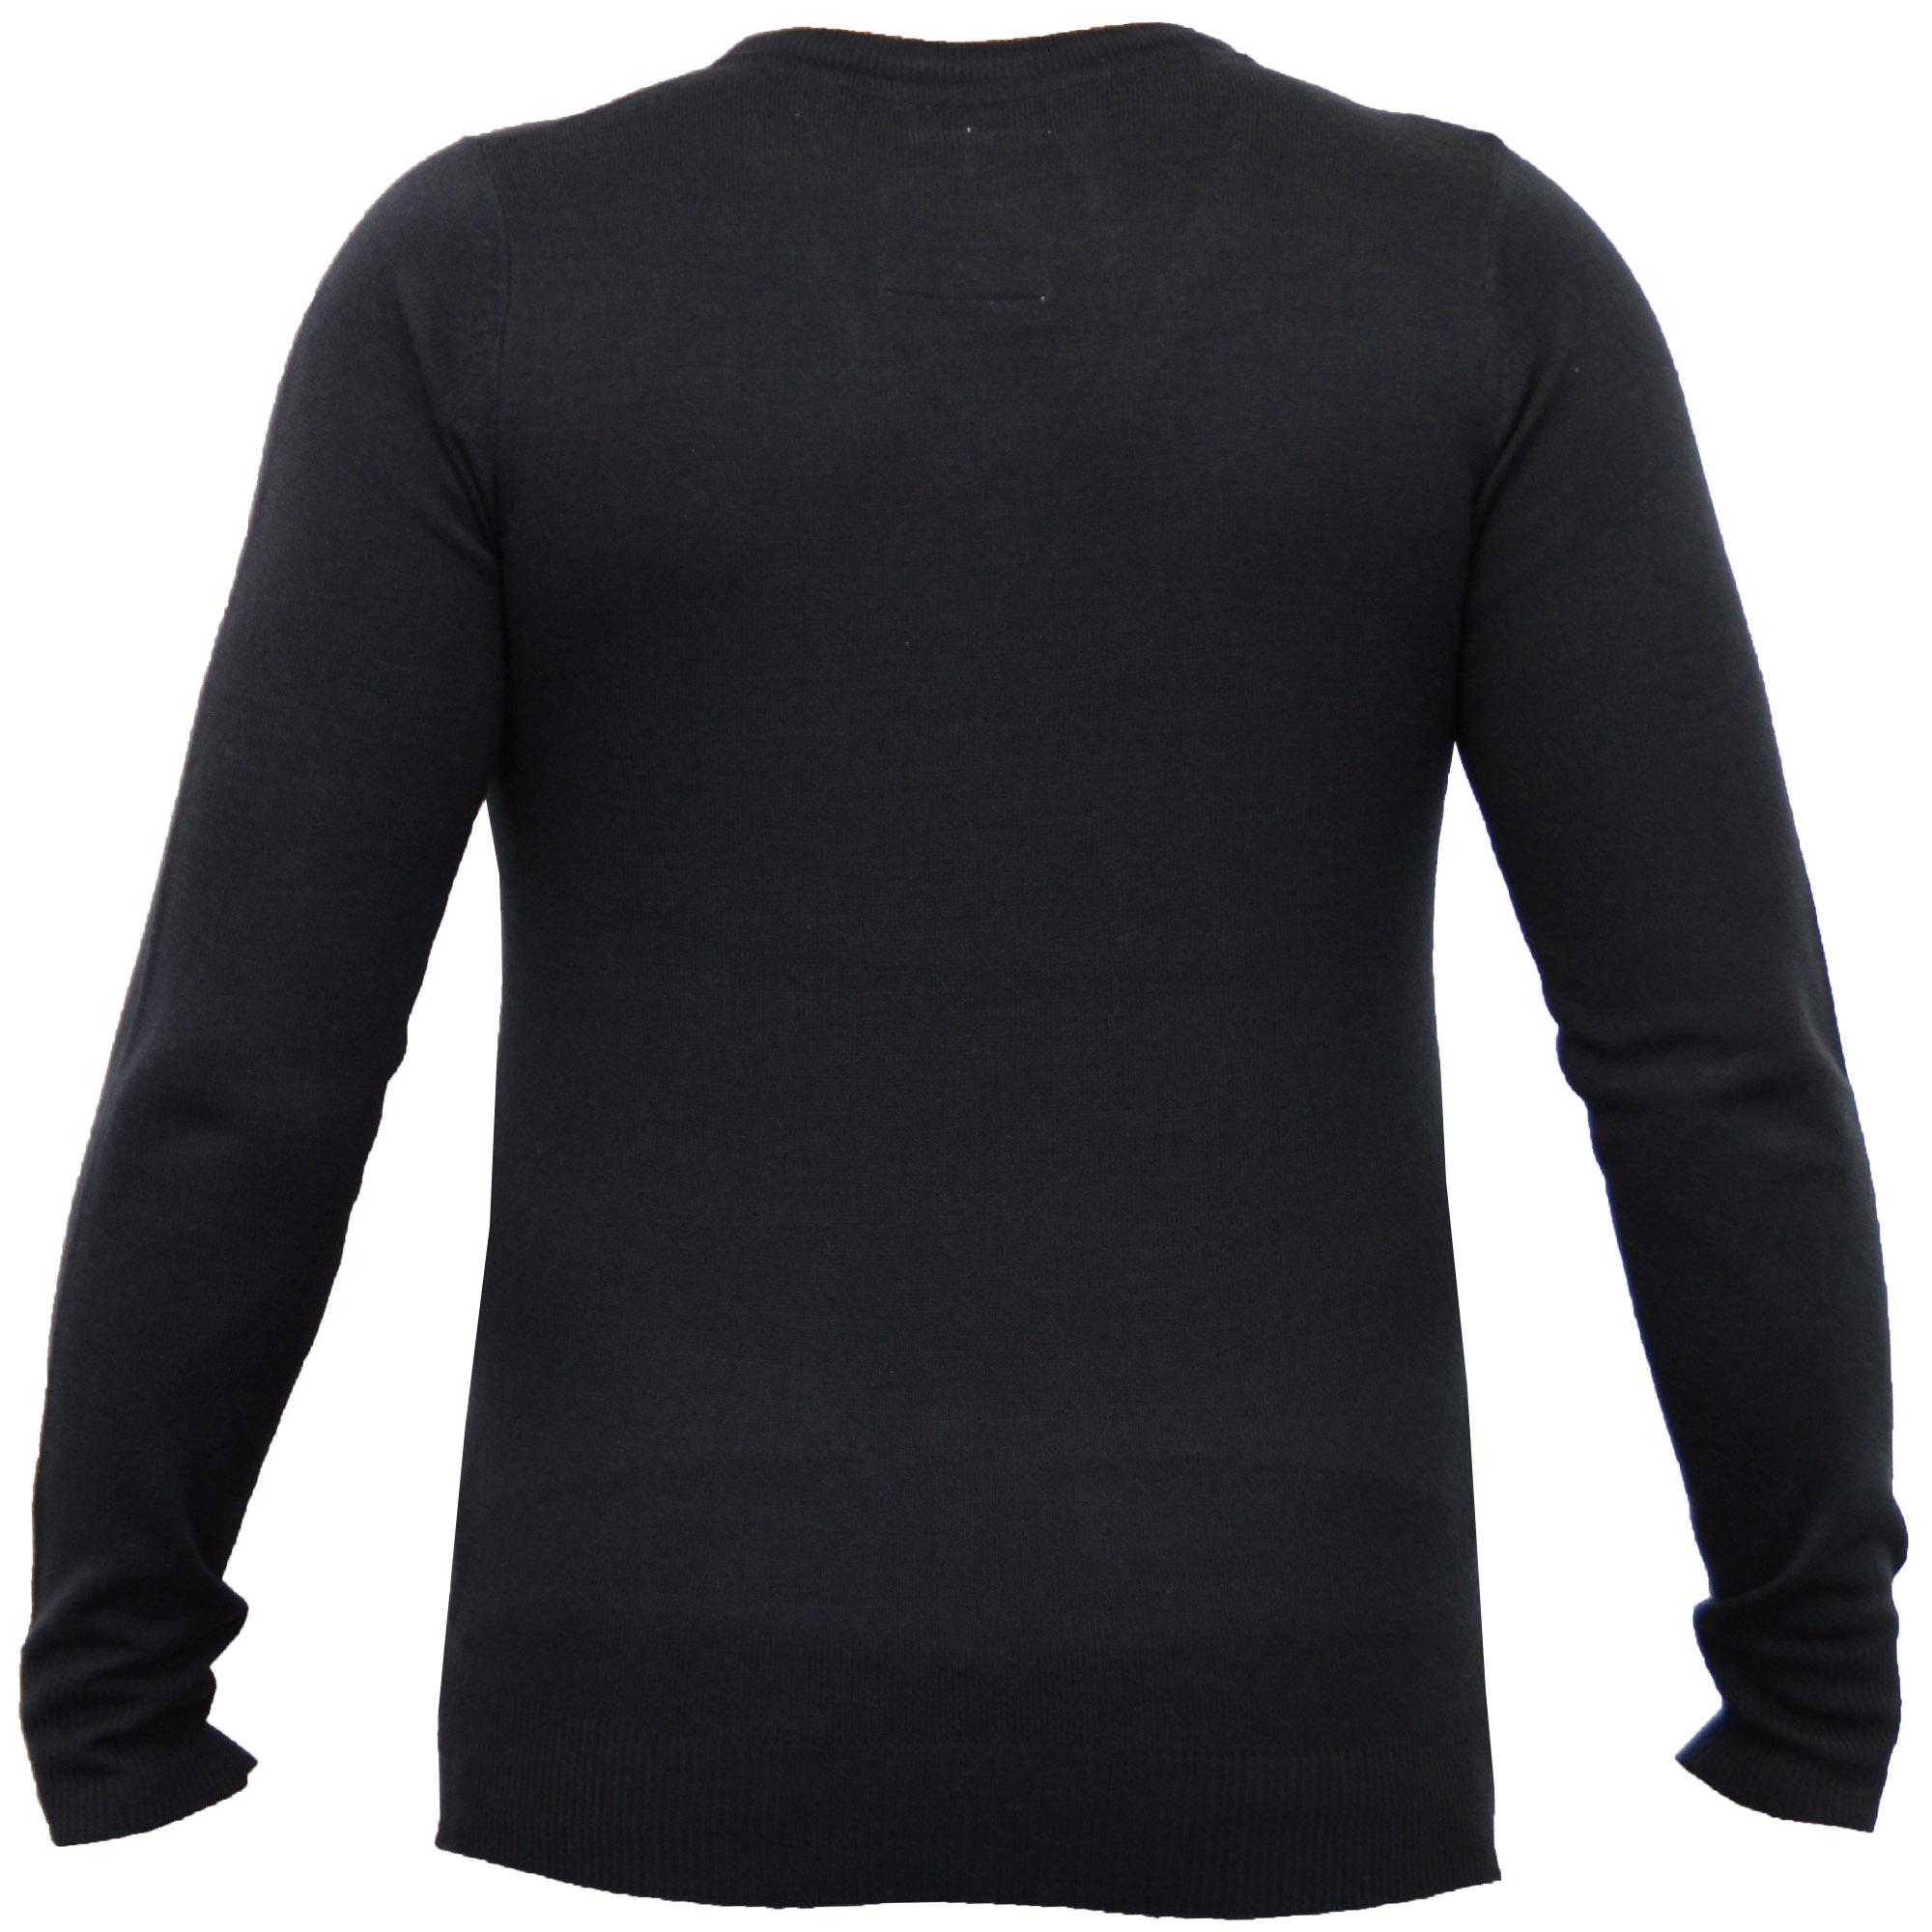 Mens-Jumper-Soul-Star-Knitted-Sweater-Pullover-Crew-V-Neck-Lightweight-Winter thumbnail 9